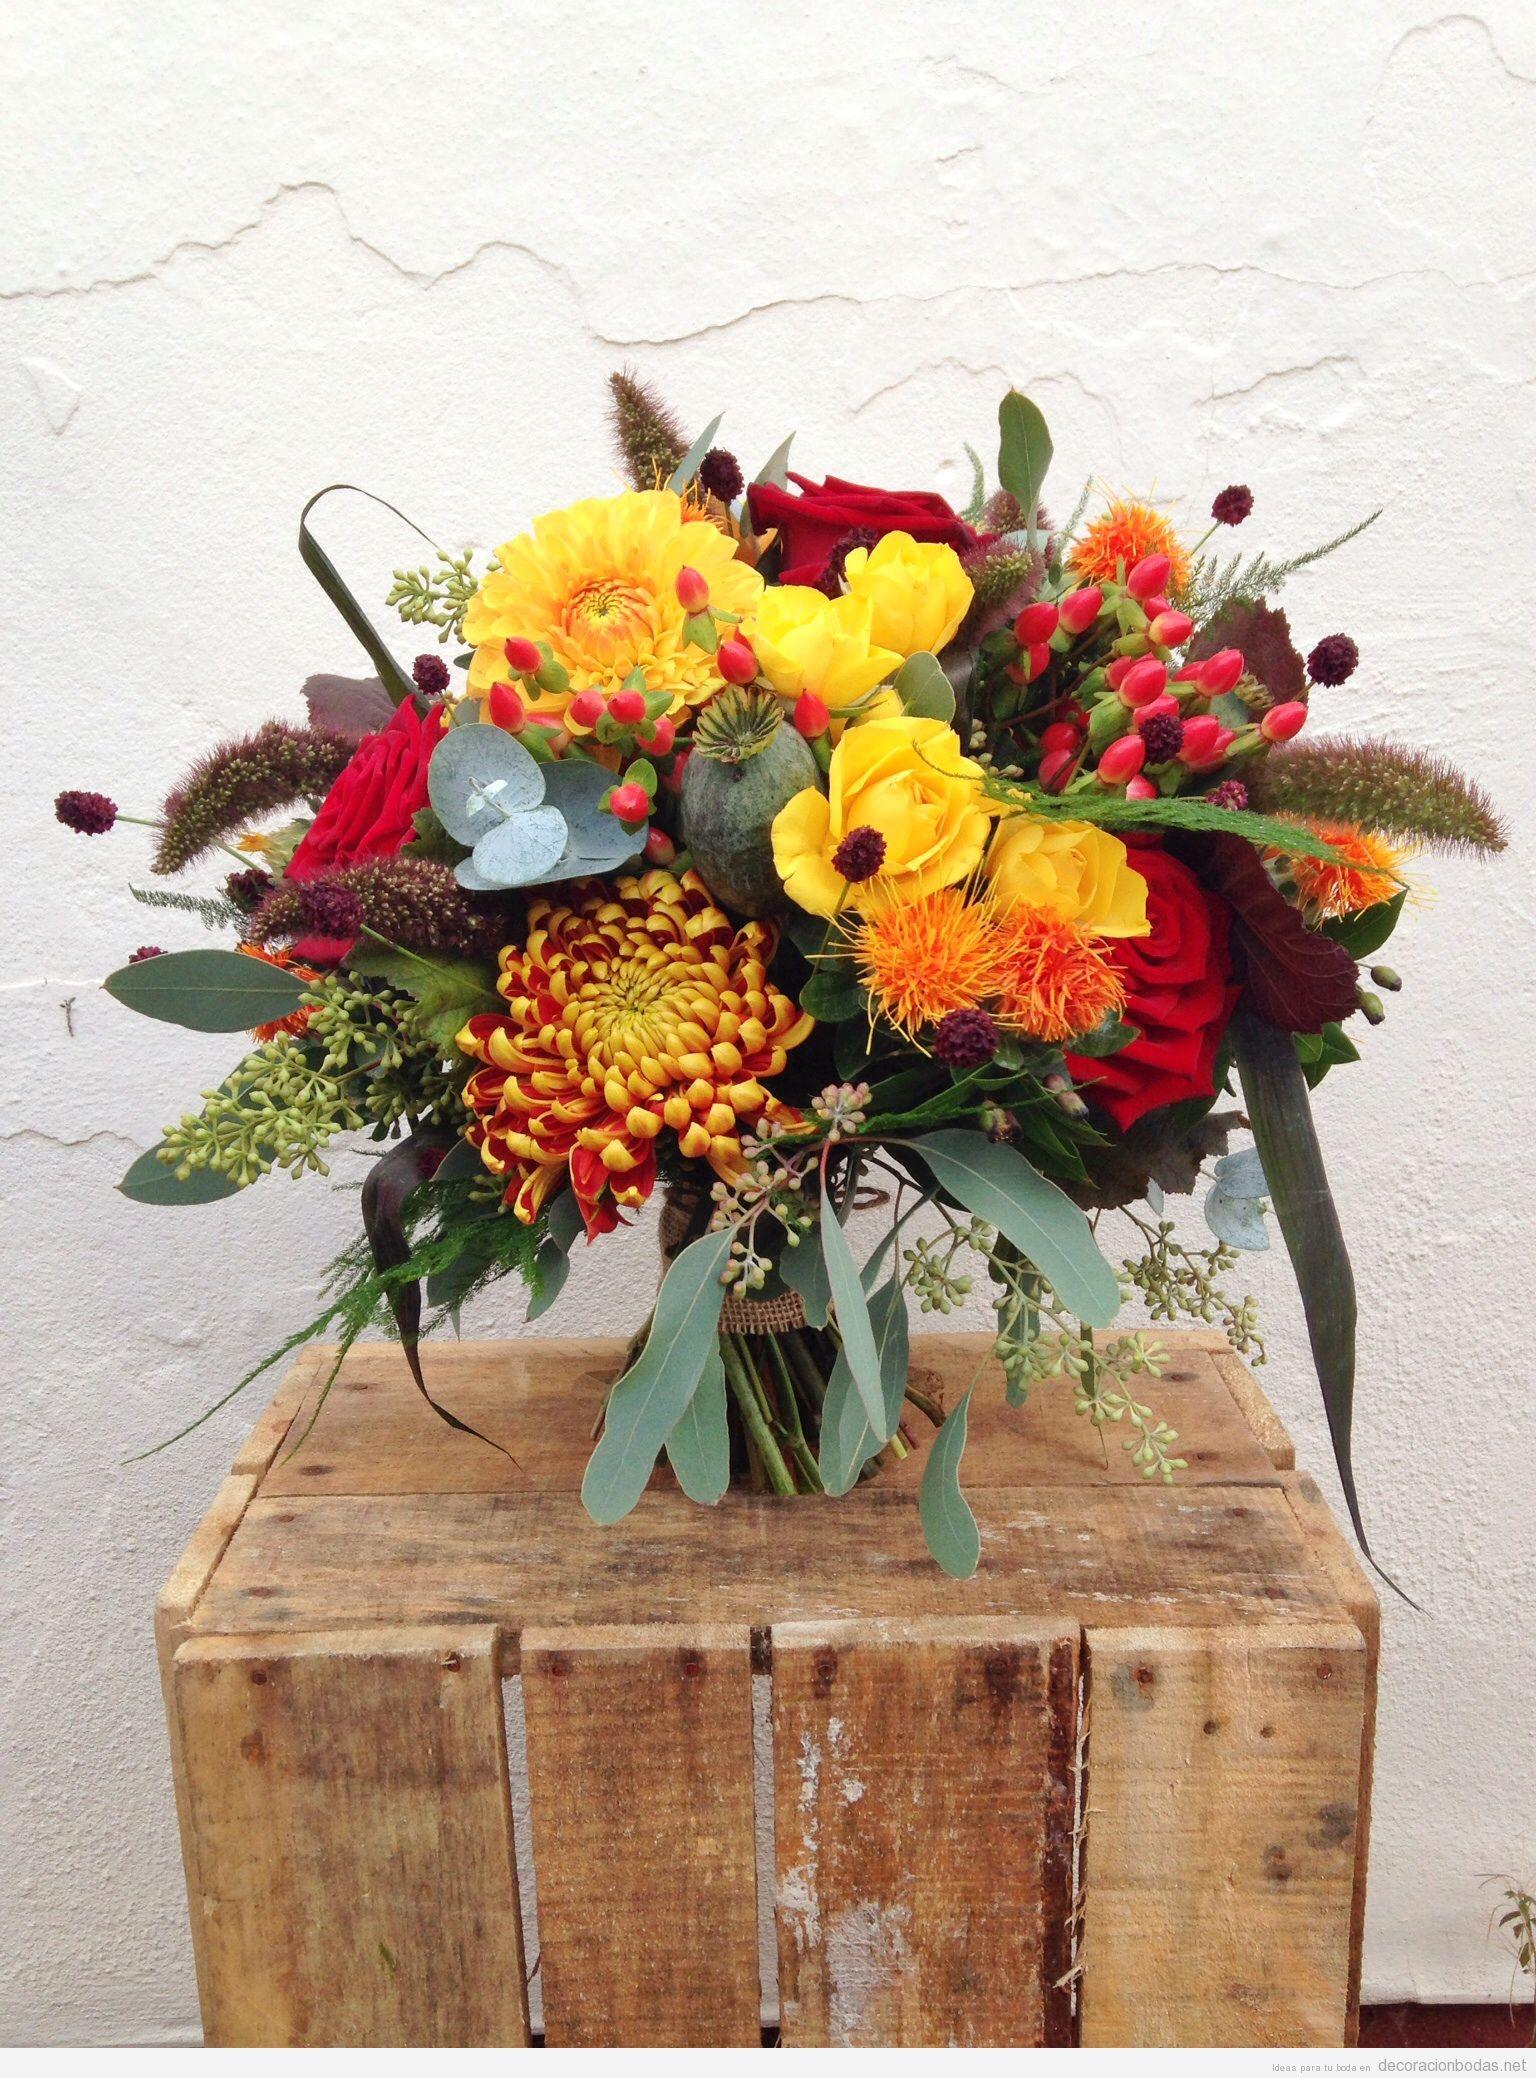 Decorar centro de mesa de boda con flores colores otoñales 4